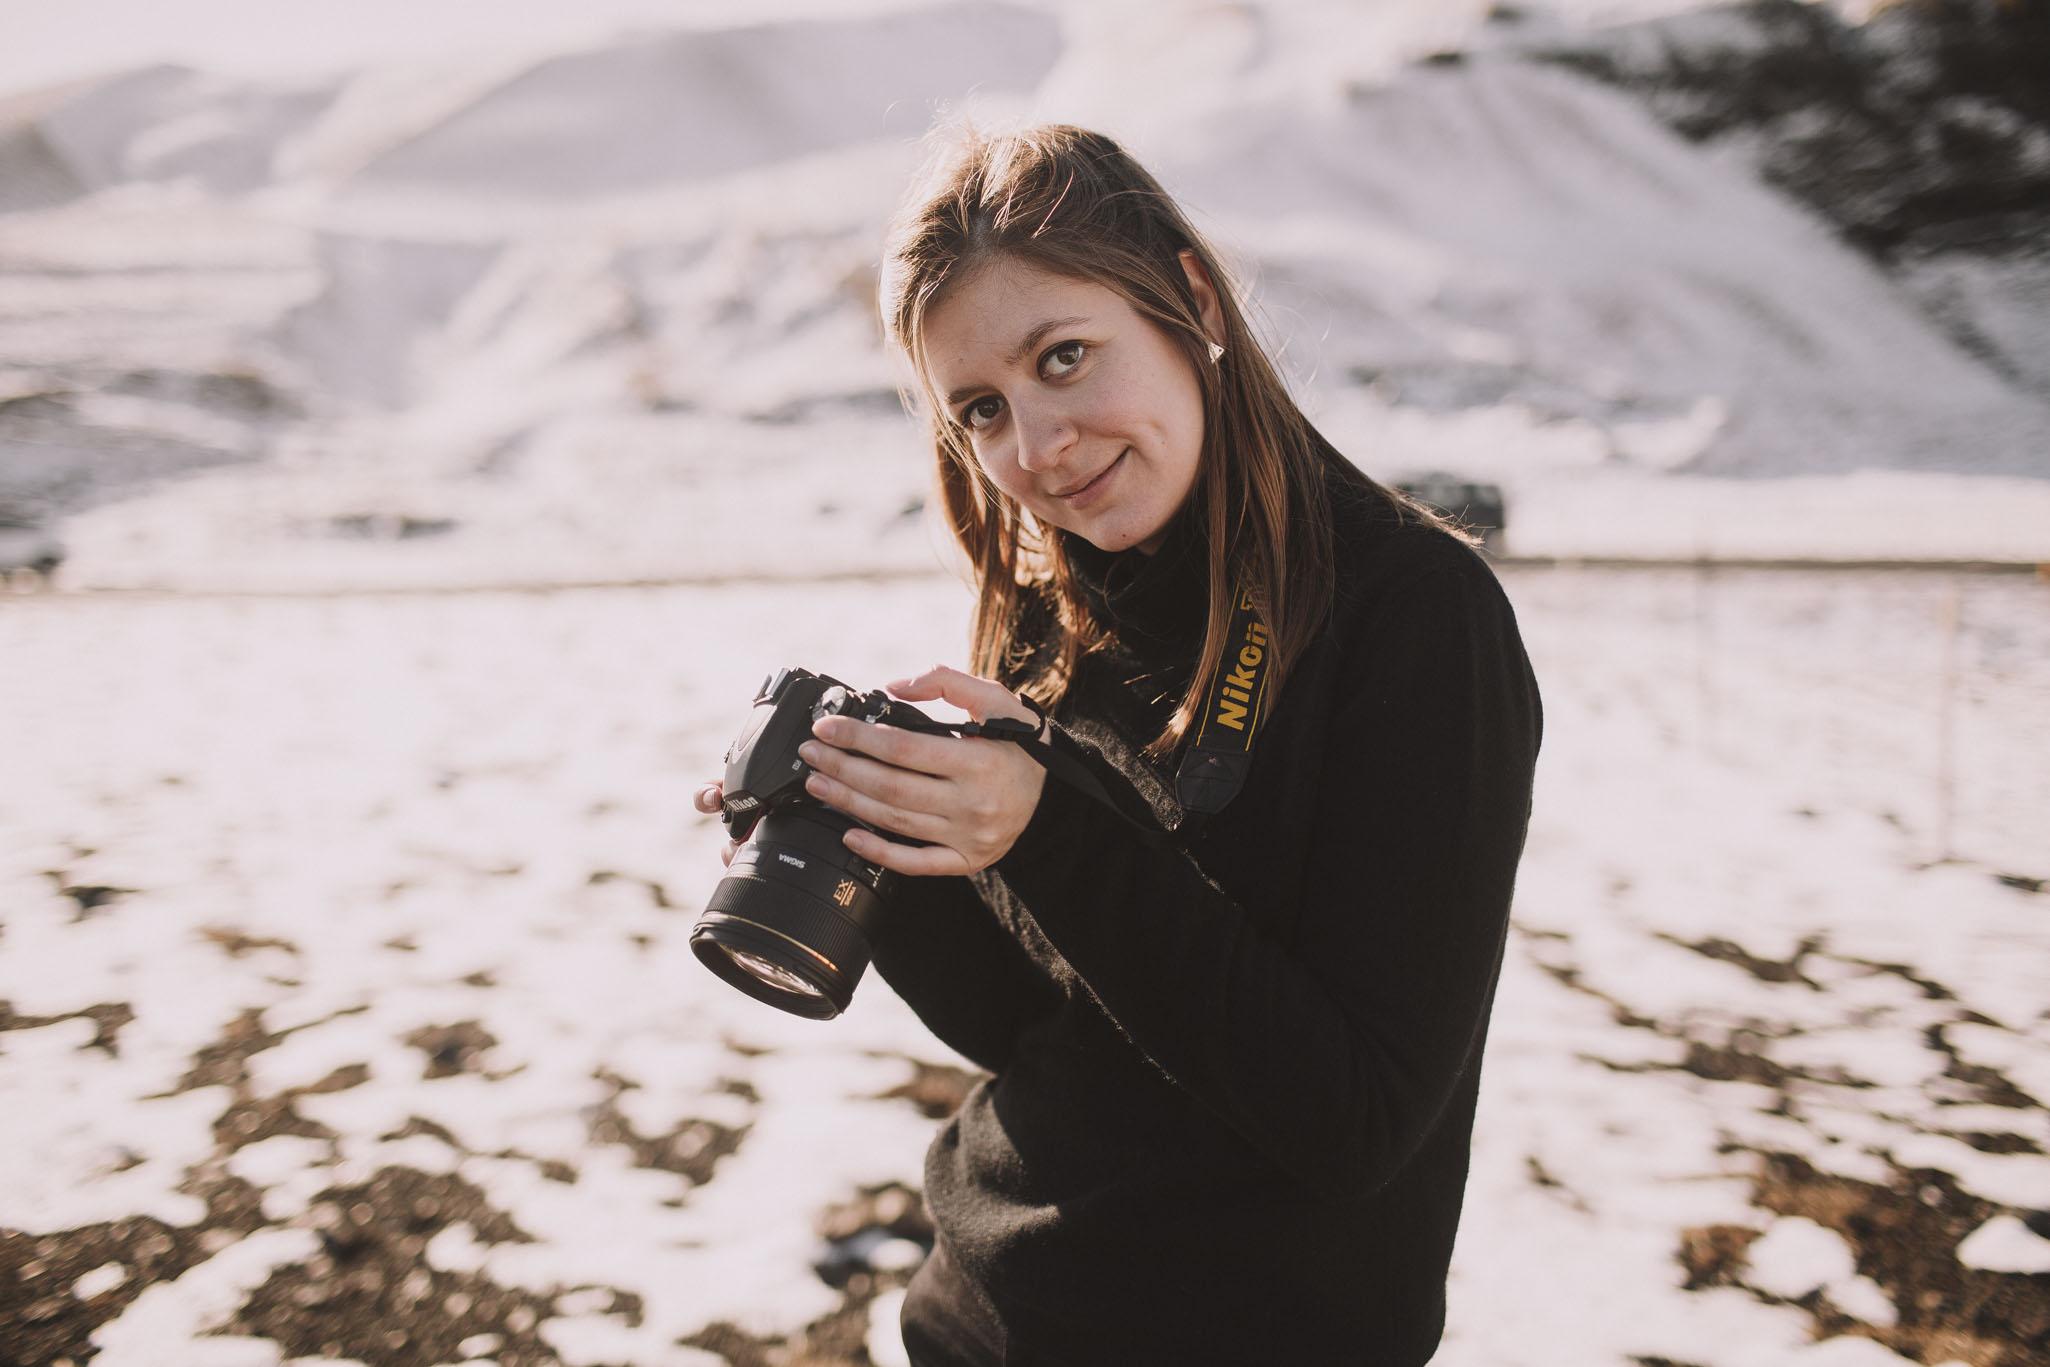 Road-trip-Islande-Iceland-Voyage-Travel-Portrait-Jérémy-Boyer-Sunny-day-between-Skogafoss-Dyrholaey-6.jpg